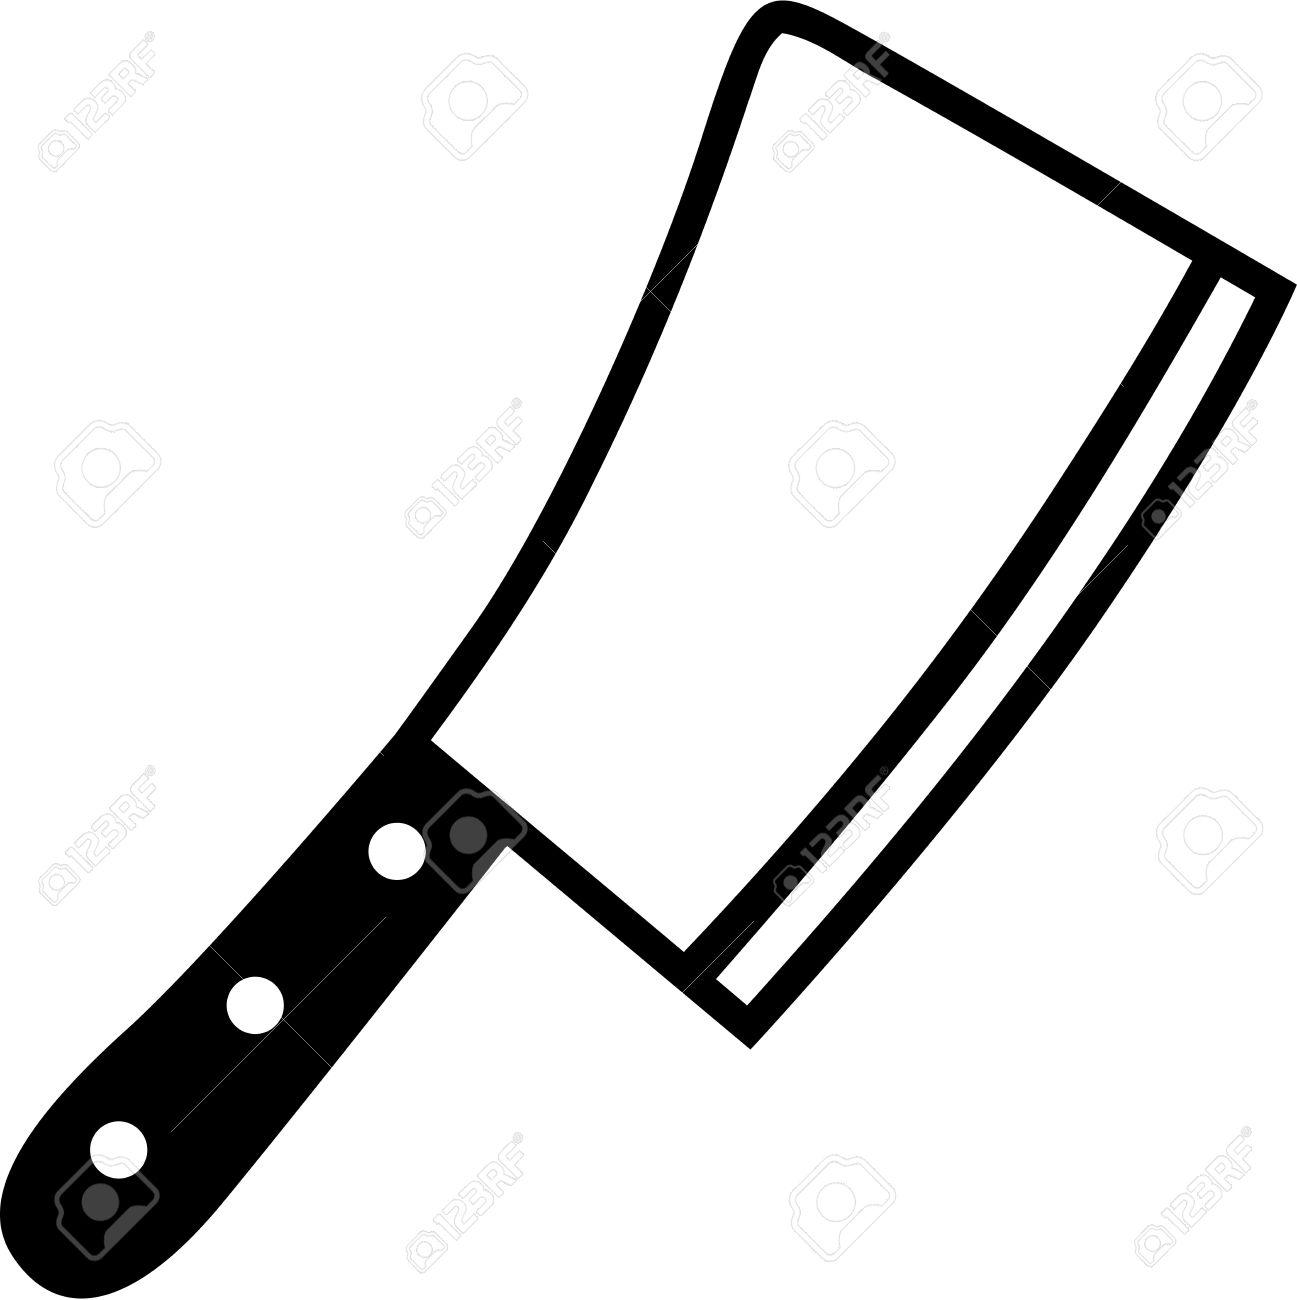 85+ Knife Clipart.